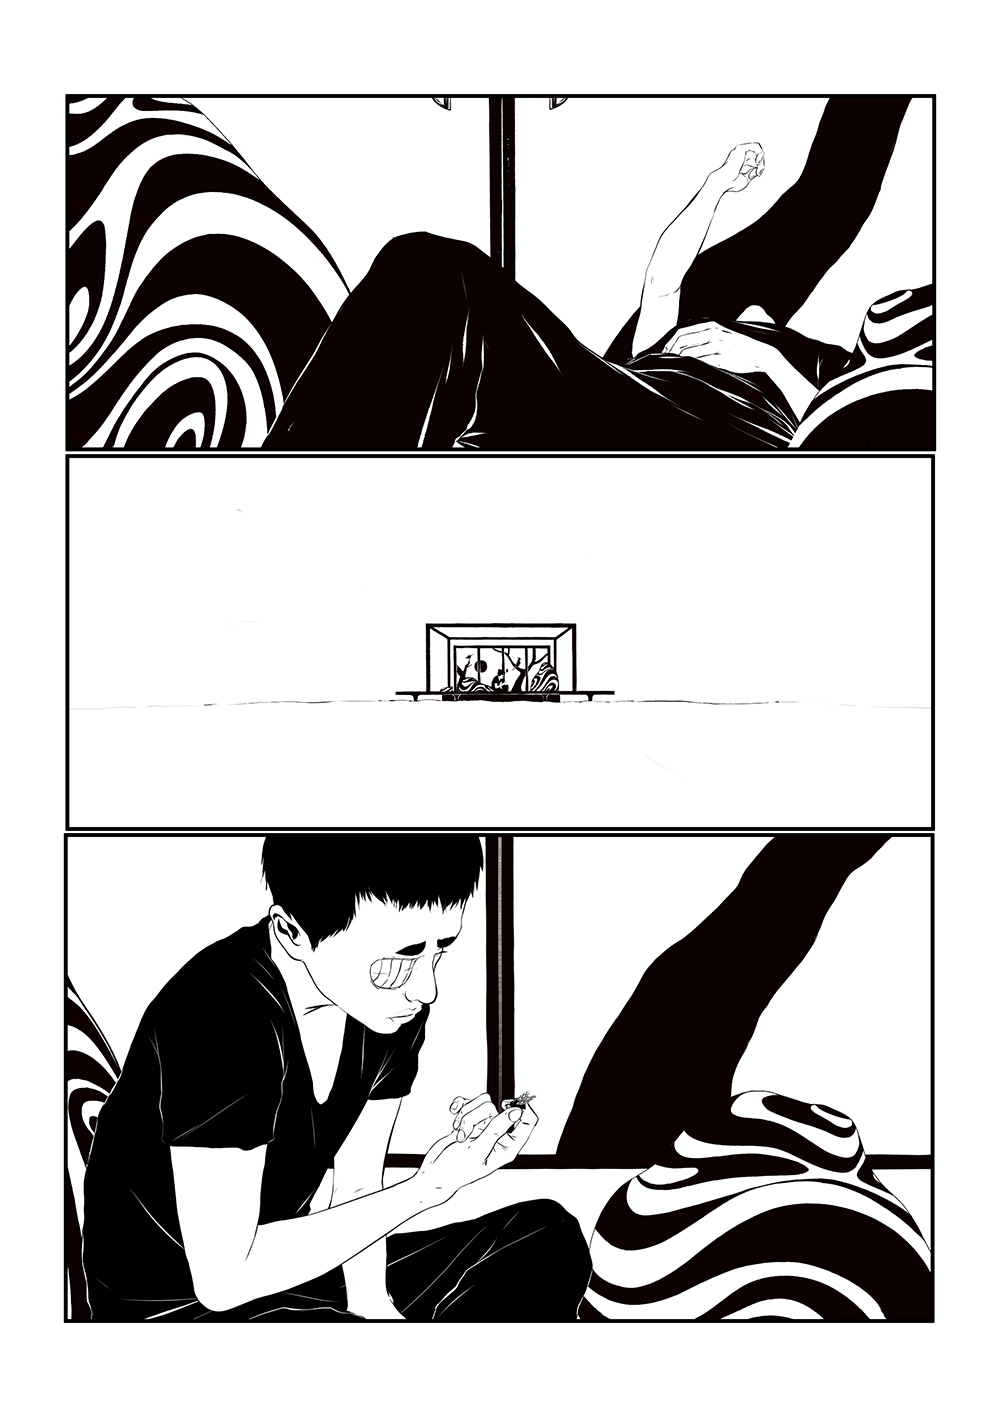 mojowang_illustration_betweenrivers_27_2.jpg